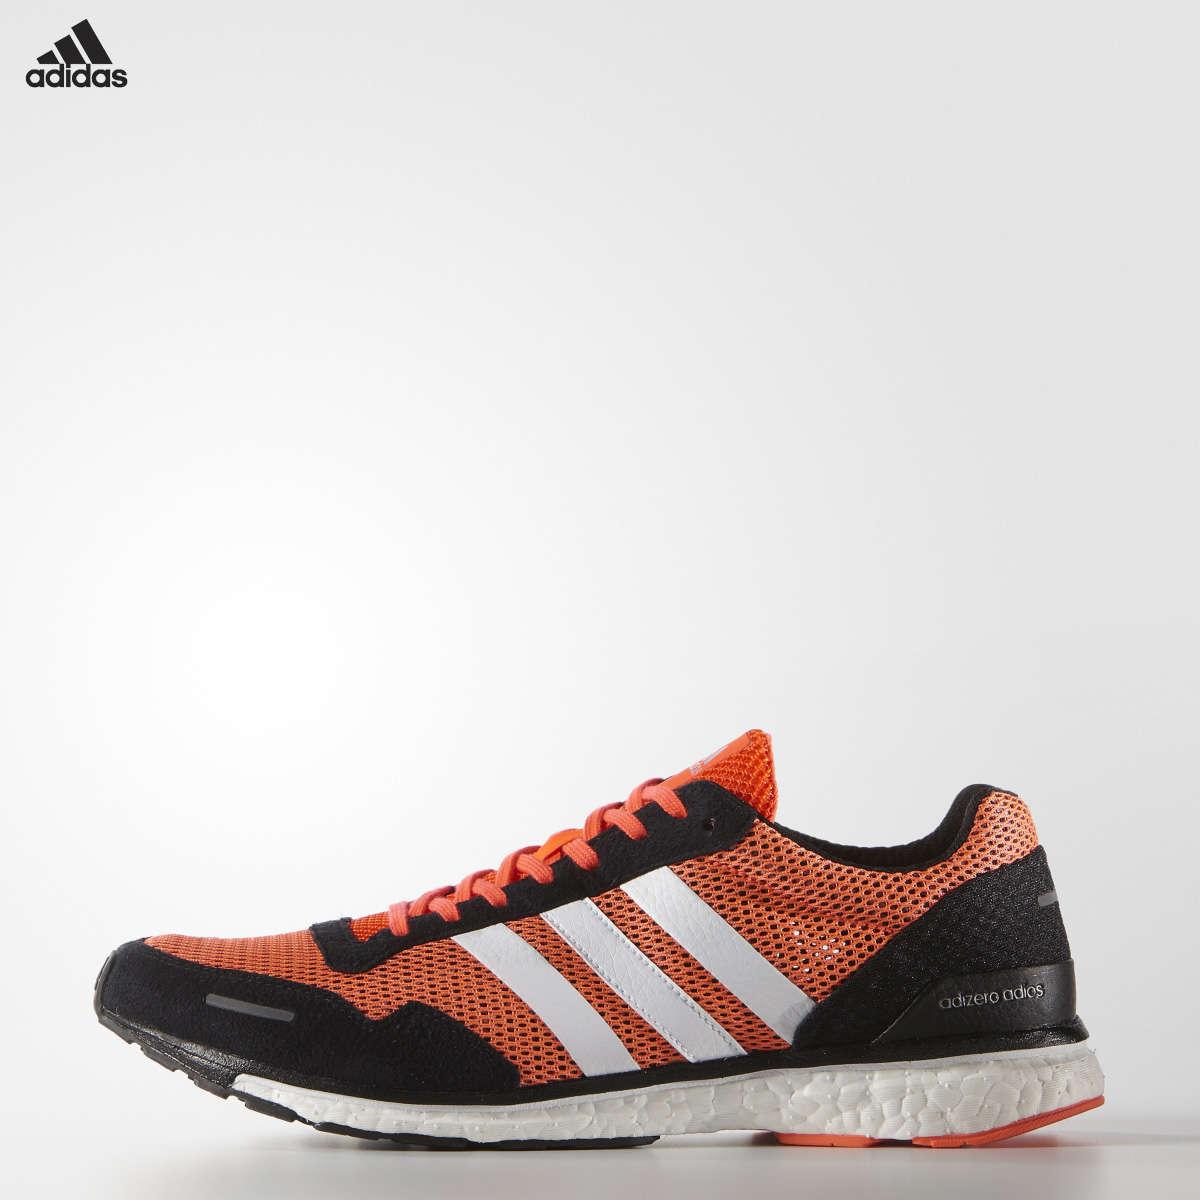 5a8d0e193a1 adidas Adizero Adios 3 Hardloopschoenen Rood/Zwart/Wit Heren koop je ...